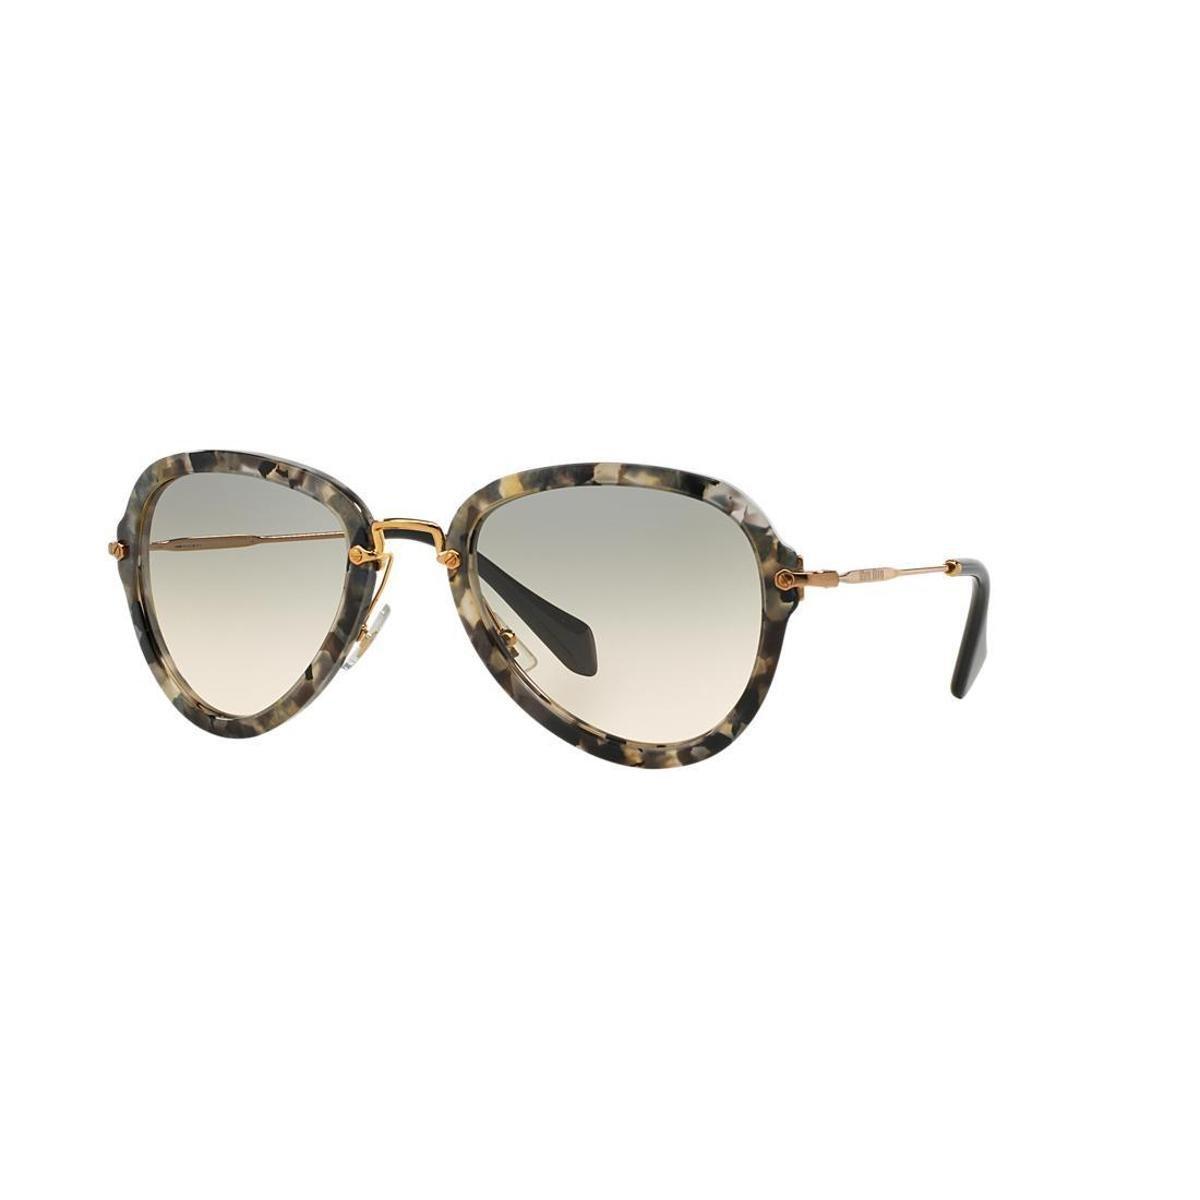 Óculos de Sol Miu Miu MU 03QS - Compre Agora   Zattini 20912a29ca